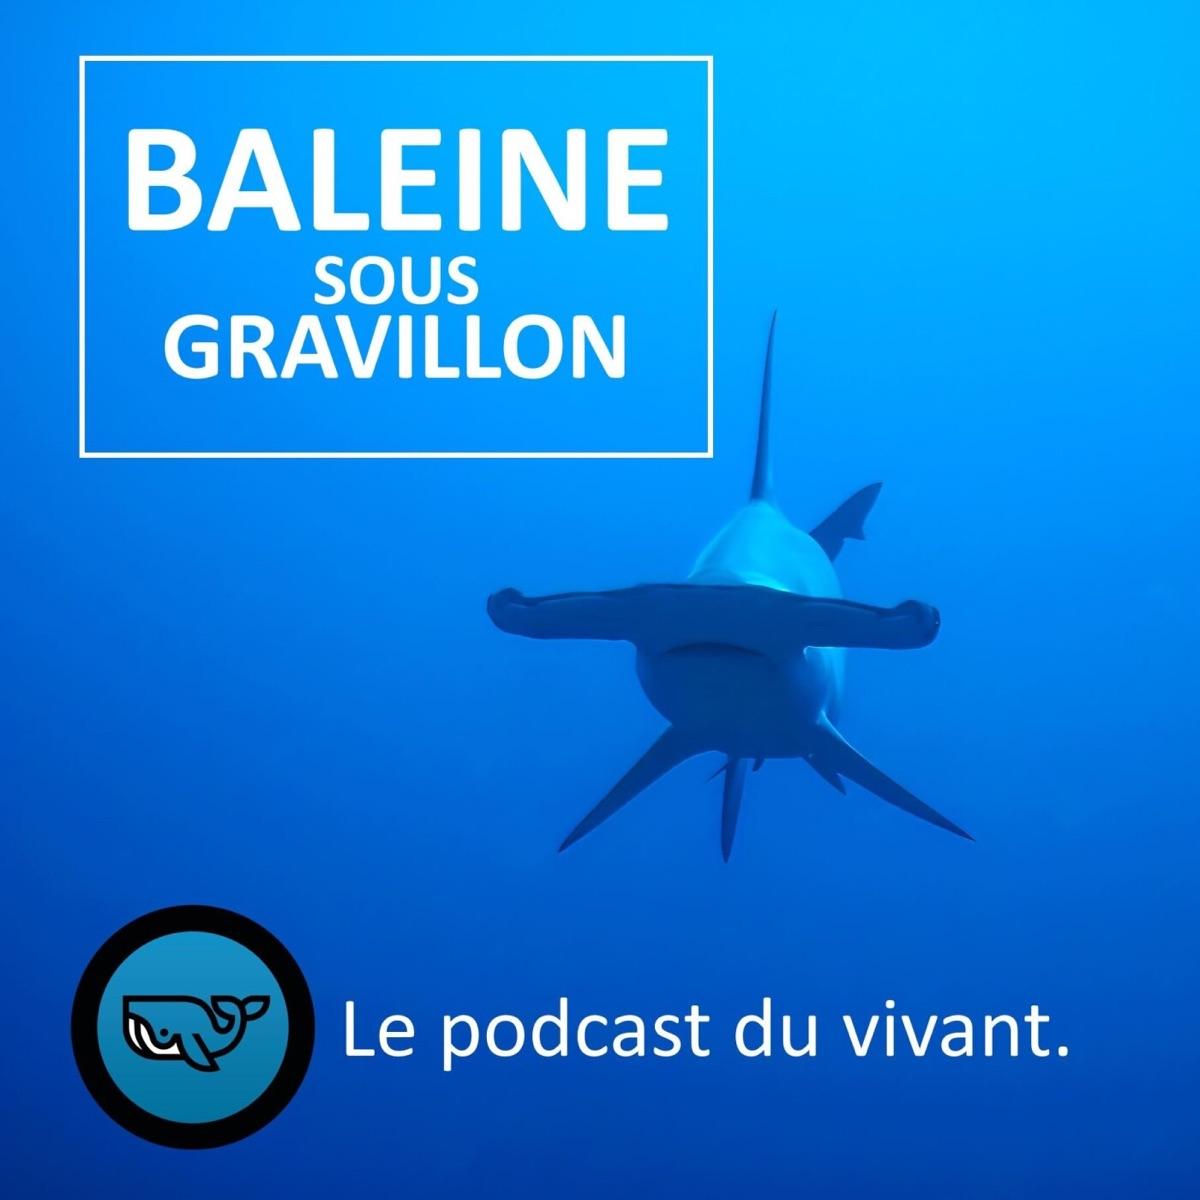 Baleine sous Gravillon (BSG)